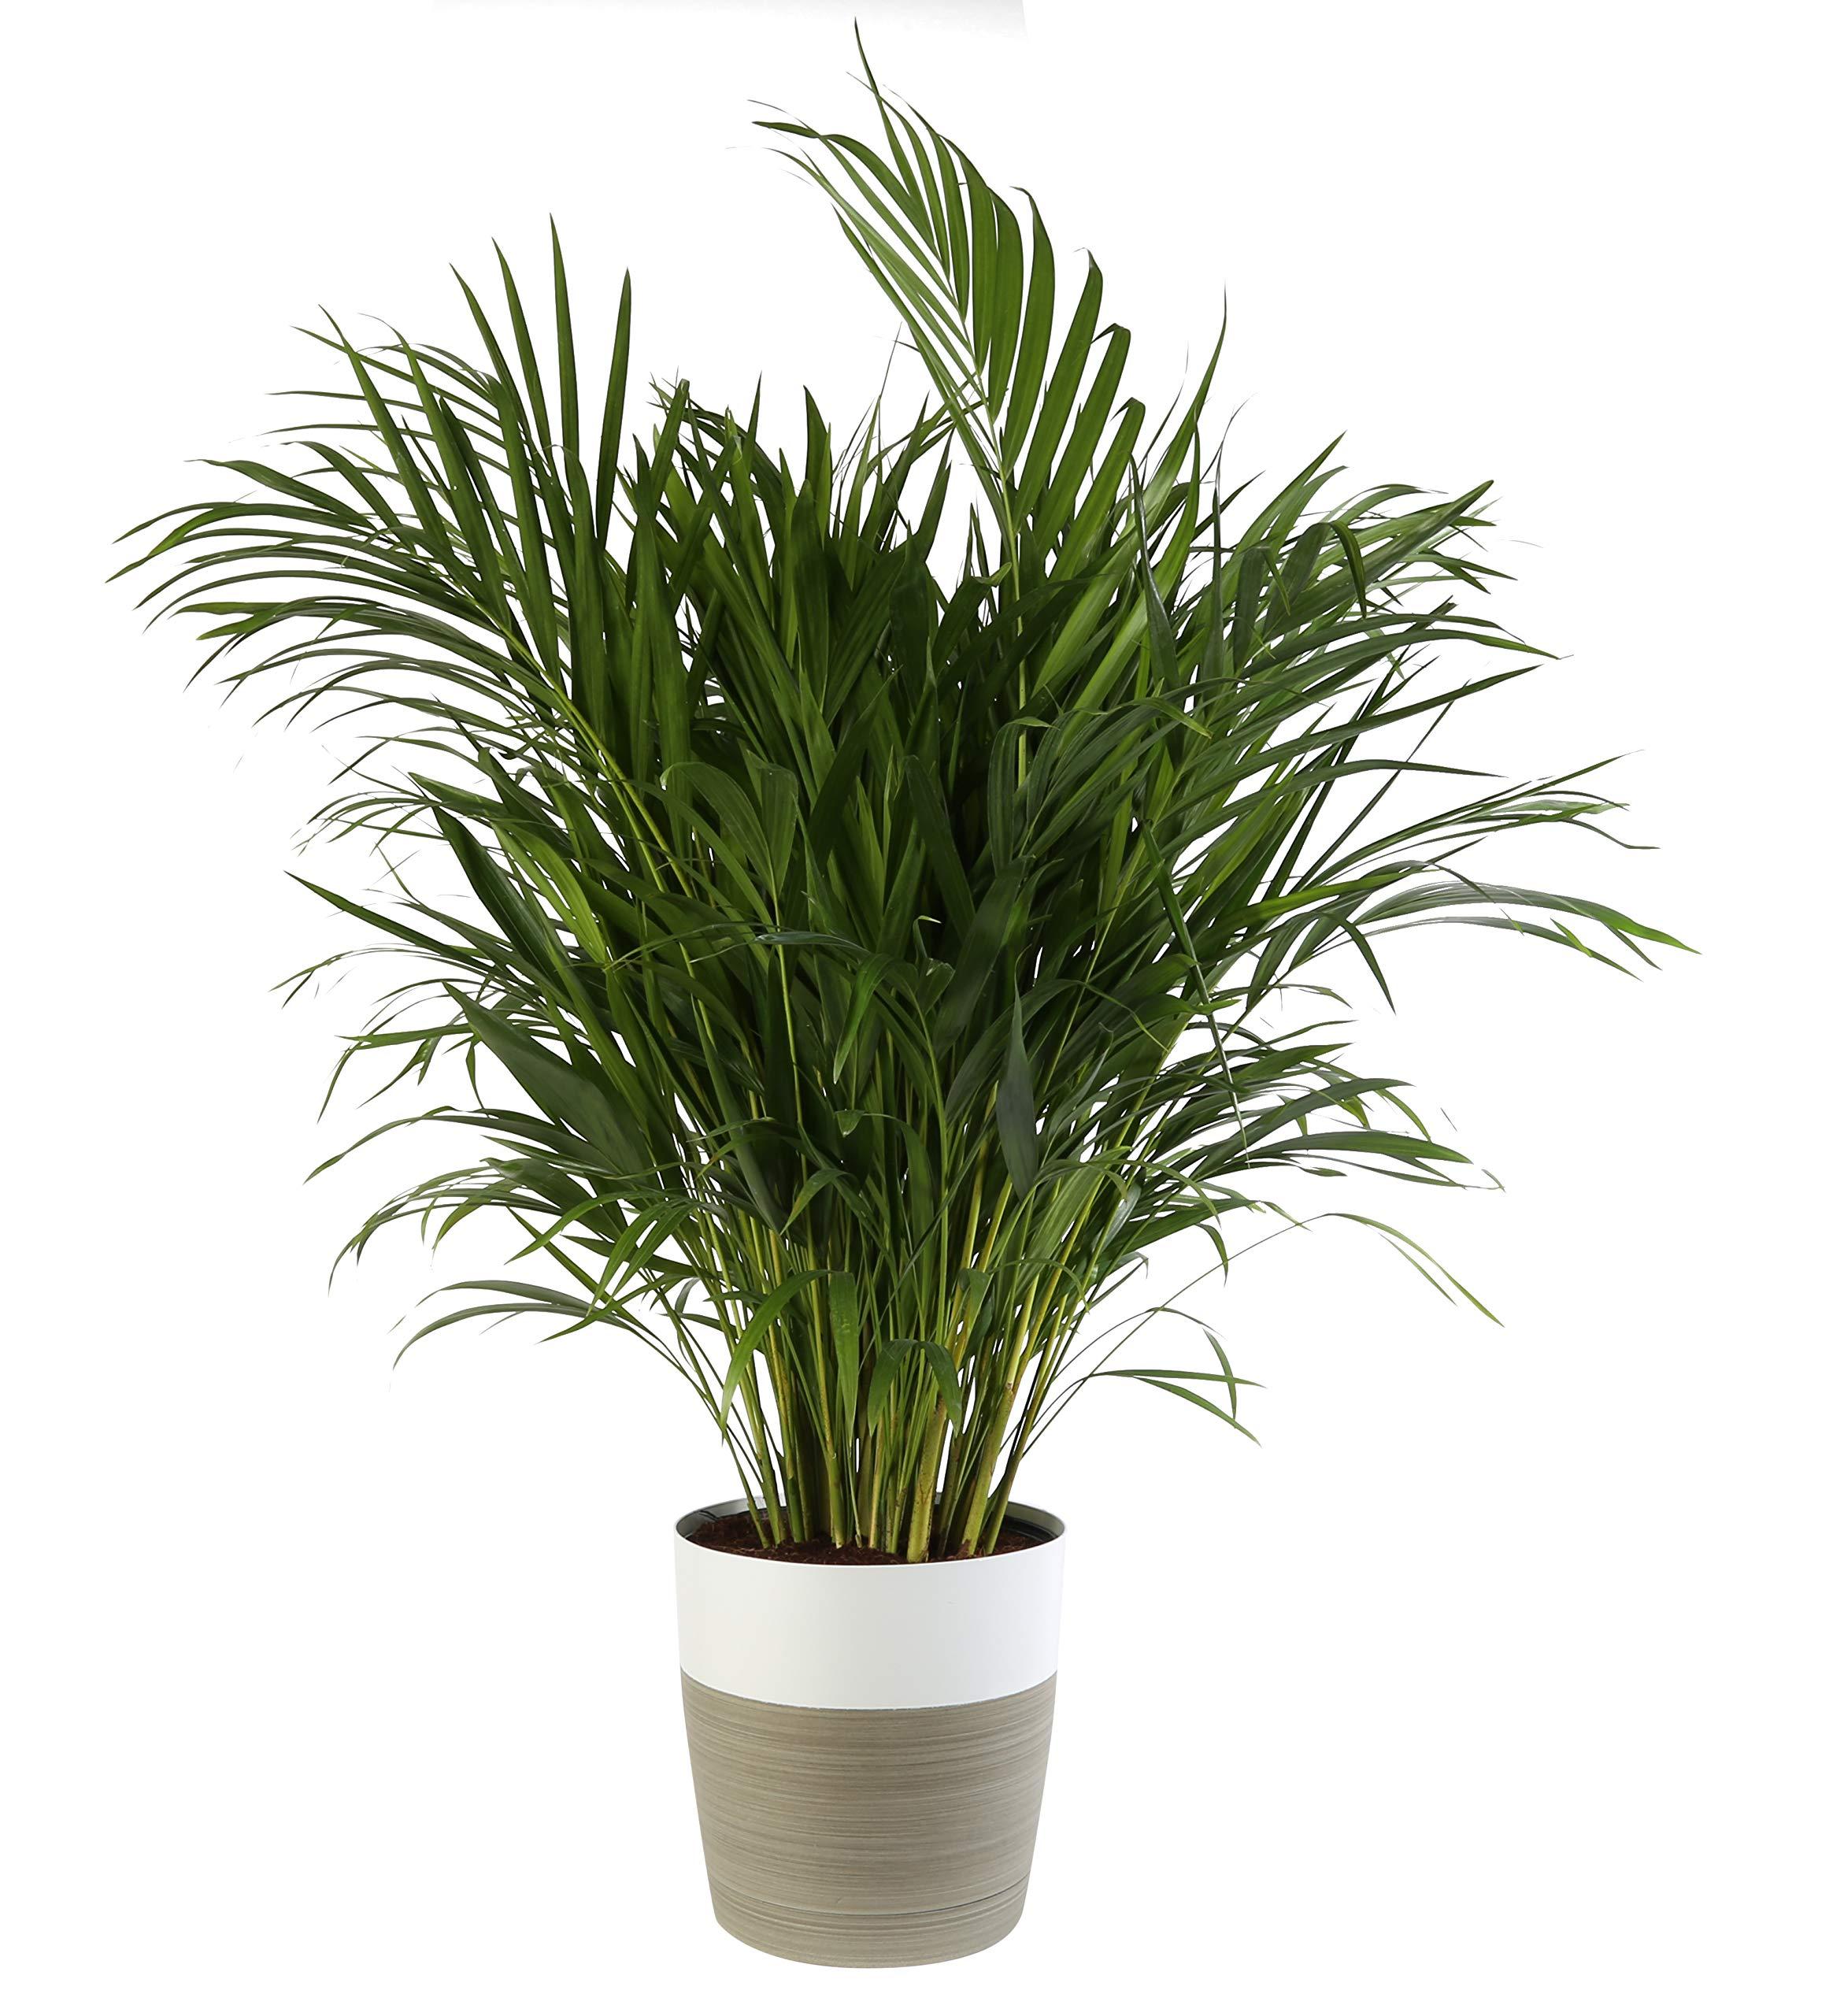 Costa Farms Live Areca Palm in Decor Planter, 3-Foot, White-Natural by Costa Farms (Image #1)